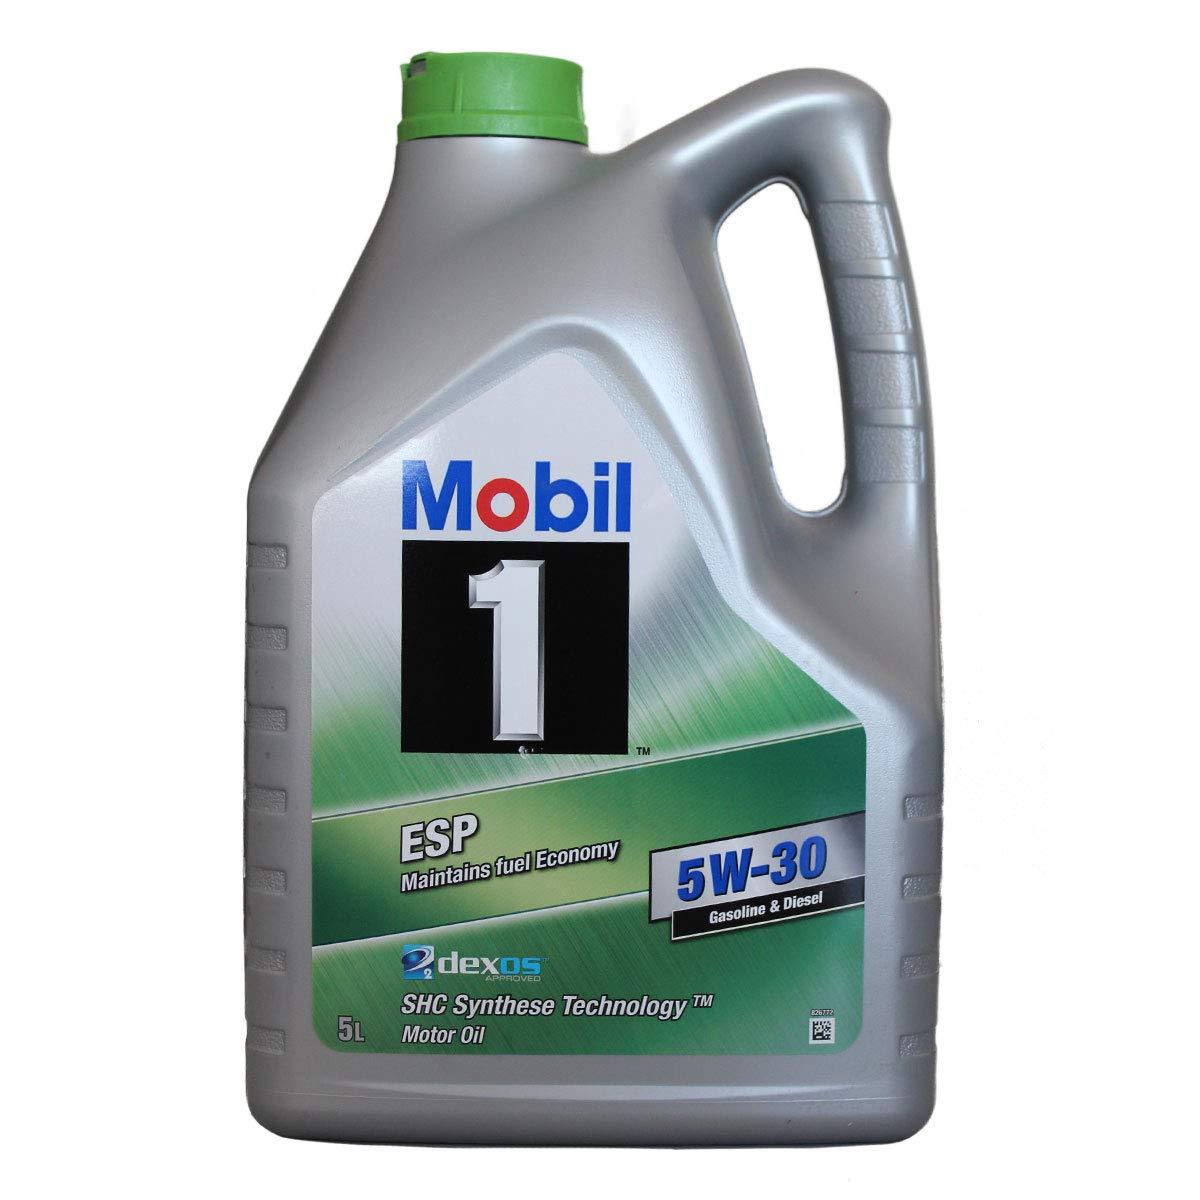 Mobil 1 ESP Formula 5W-30 Engine Oil, 1L ExxonMobil Lubricants & Petroleum Specialties 151054